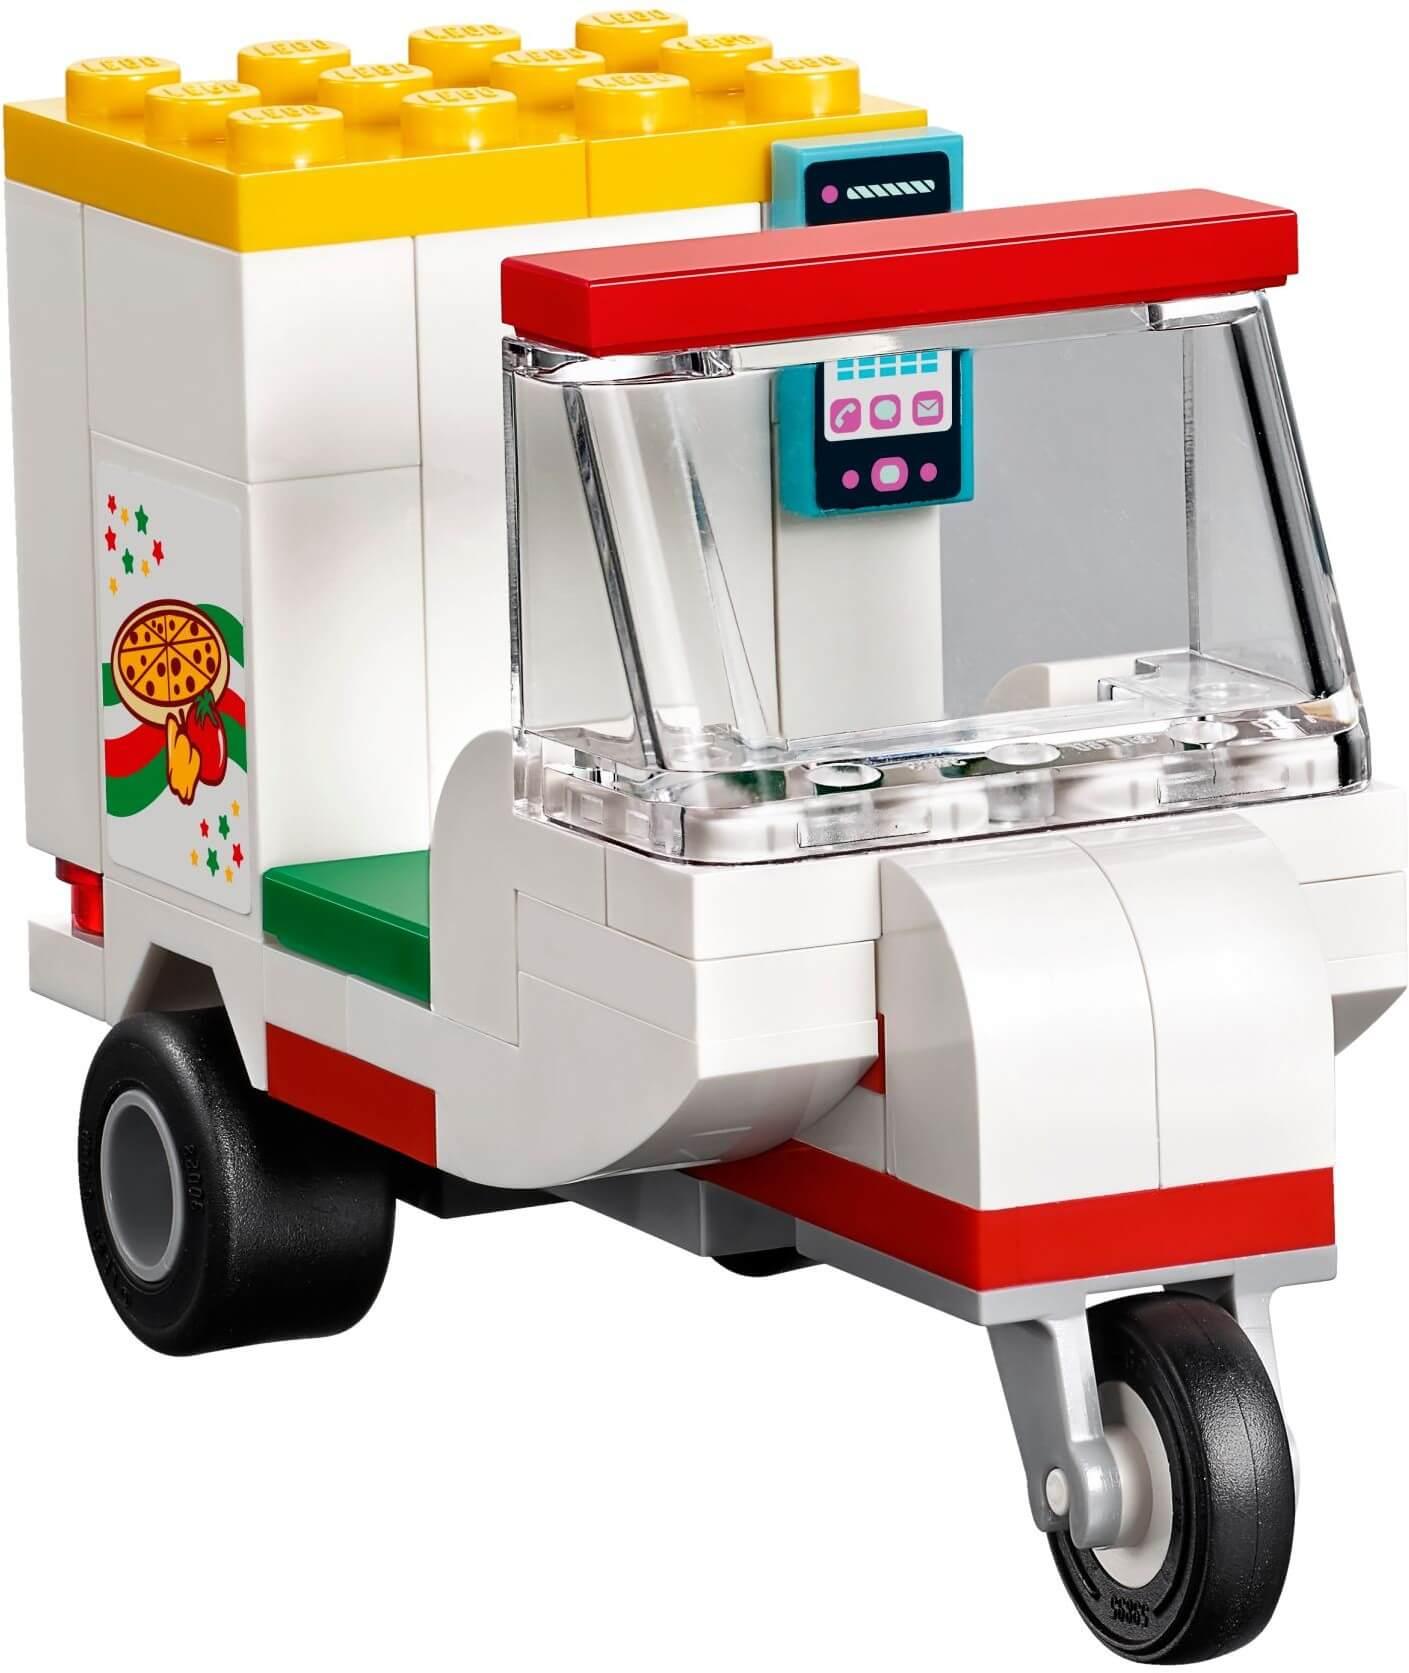 Mua đồ chơi LEGO 41311 - LEGO Friends 41311 - Tiệm Bánh Pizza Heartlake (LEGO 41311 Heartlake Pizzeria)